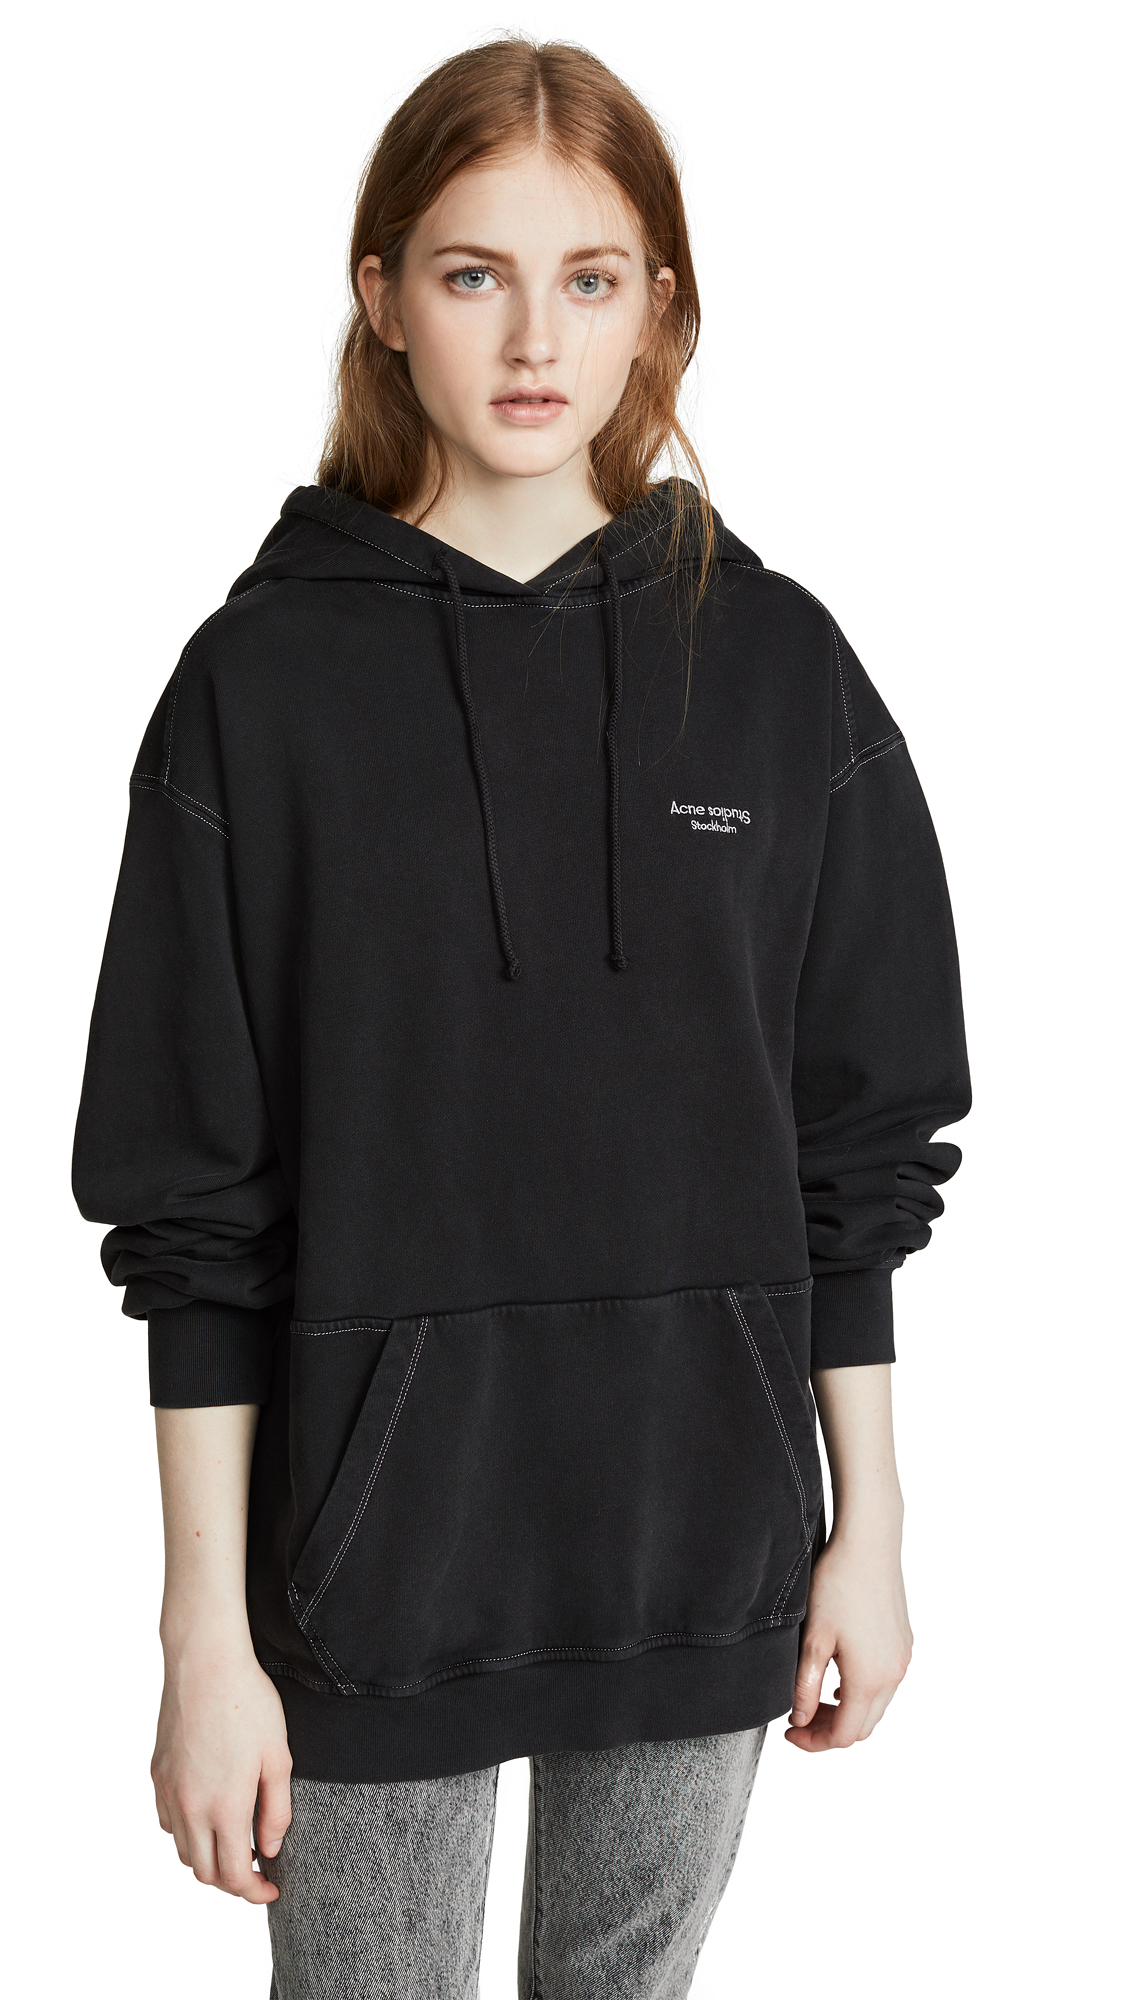 Acne Studios Weny Acid Wash Sweatshirt - Black